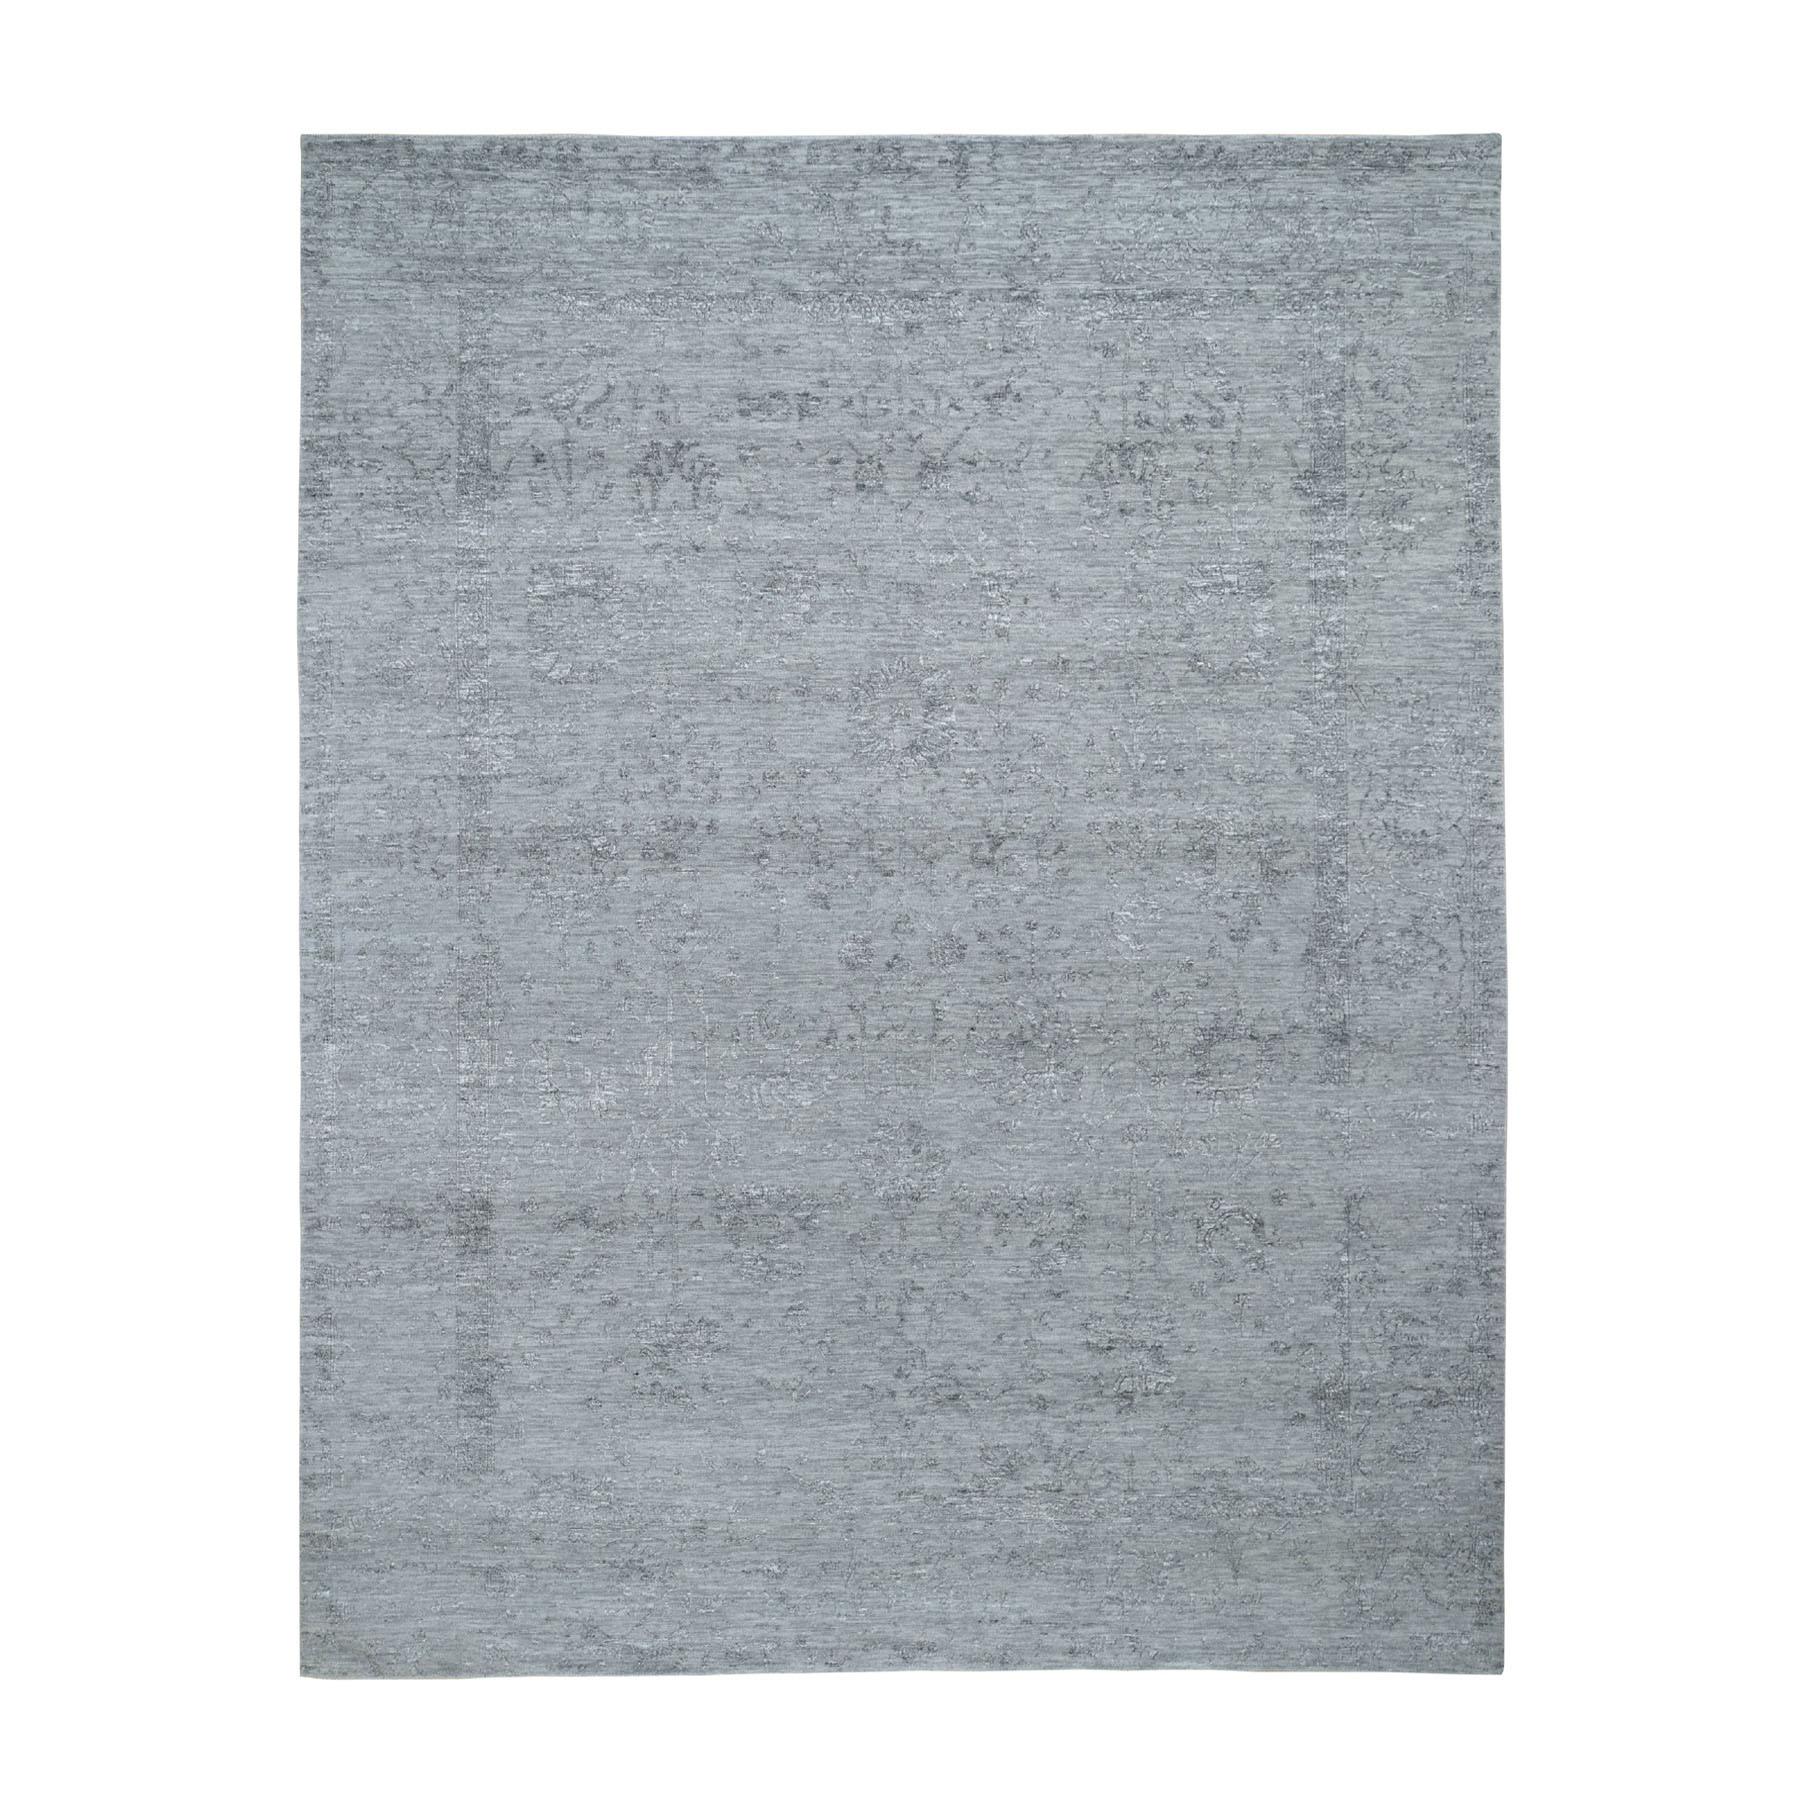 8'x10' Gray Tabriz Broken Design Wool And Silk Hand Knotted Oriental Rug